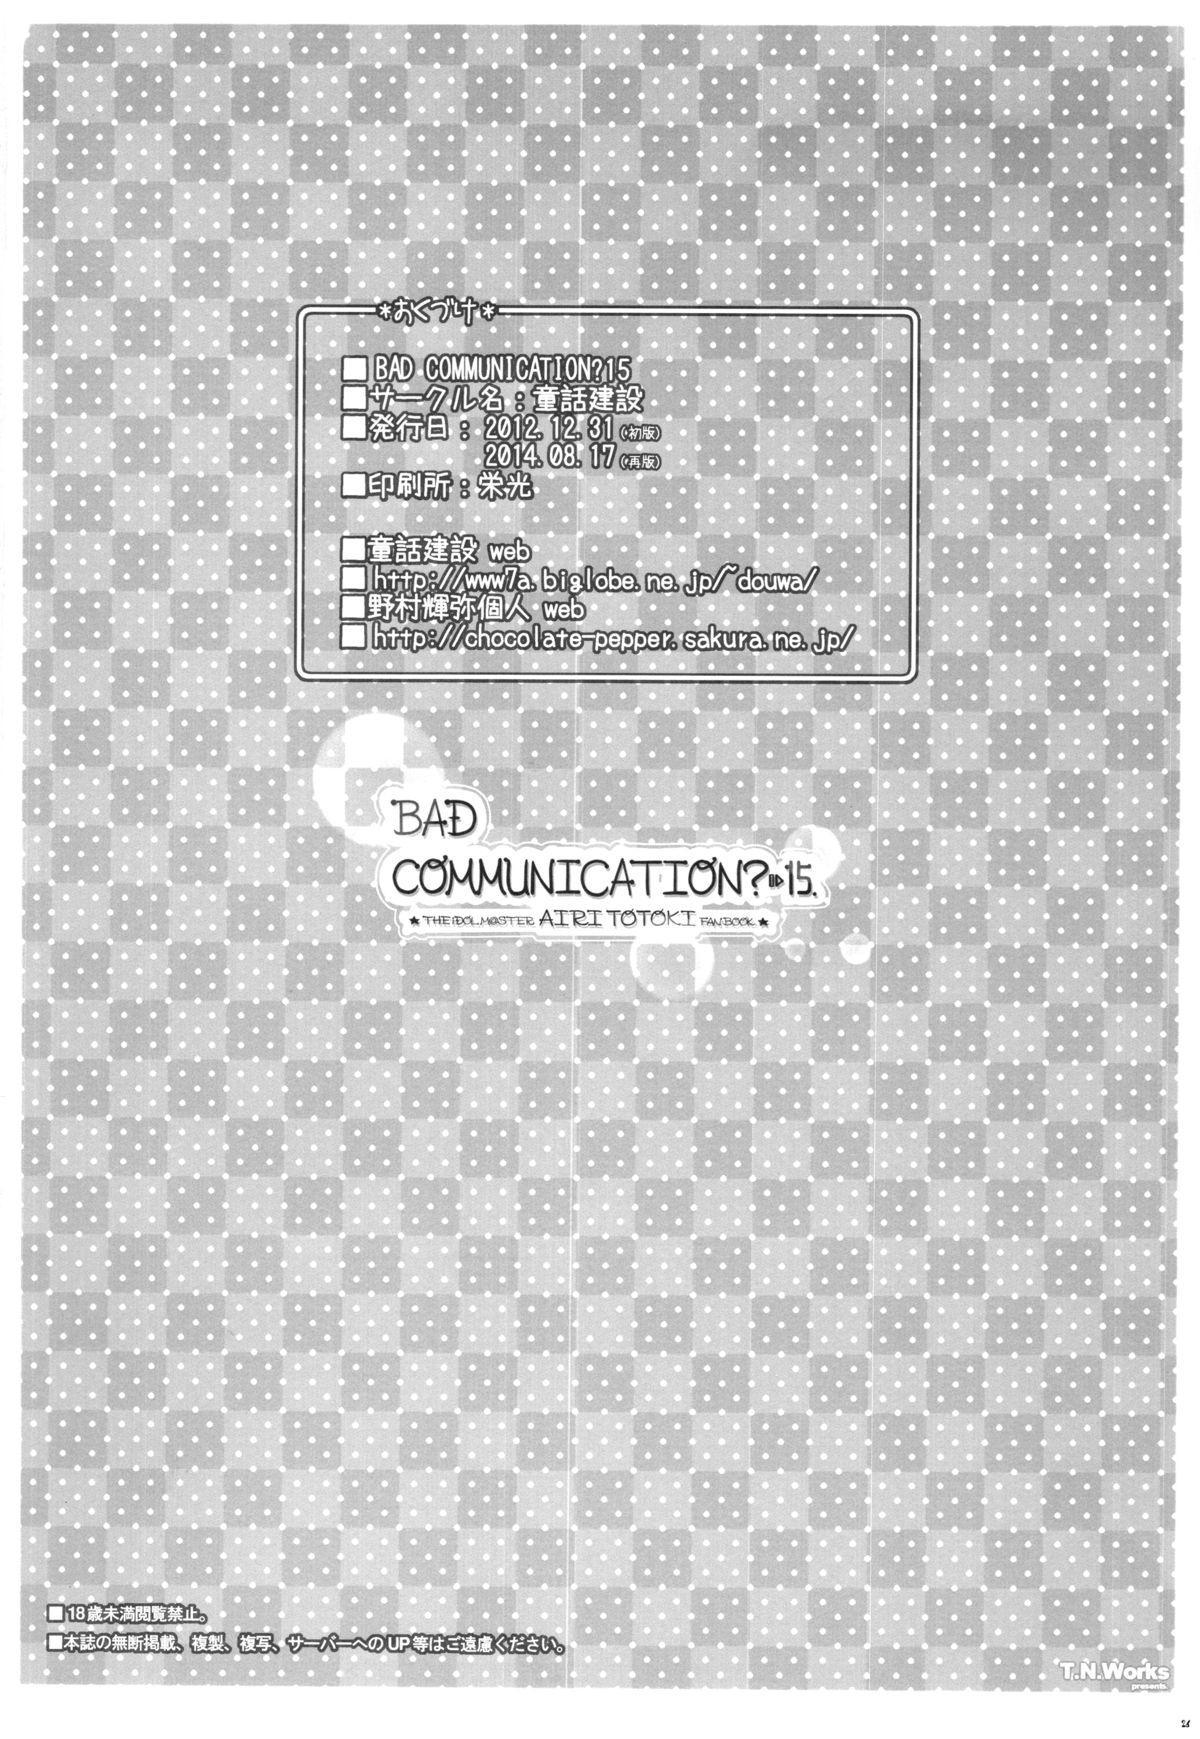 BAD COMMUNICATION? 15 26